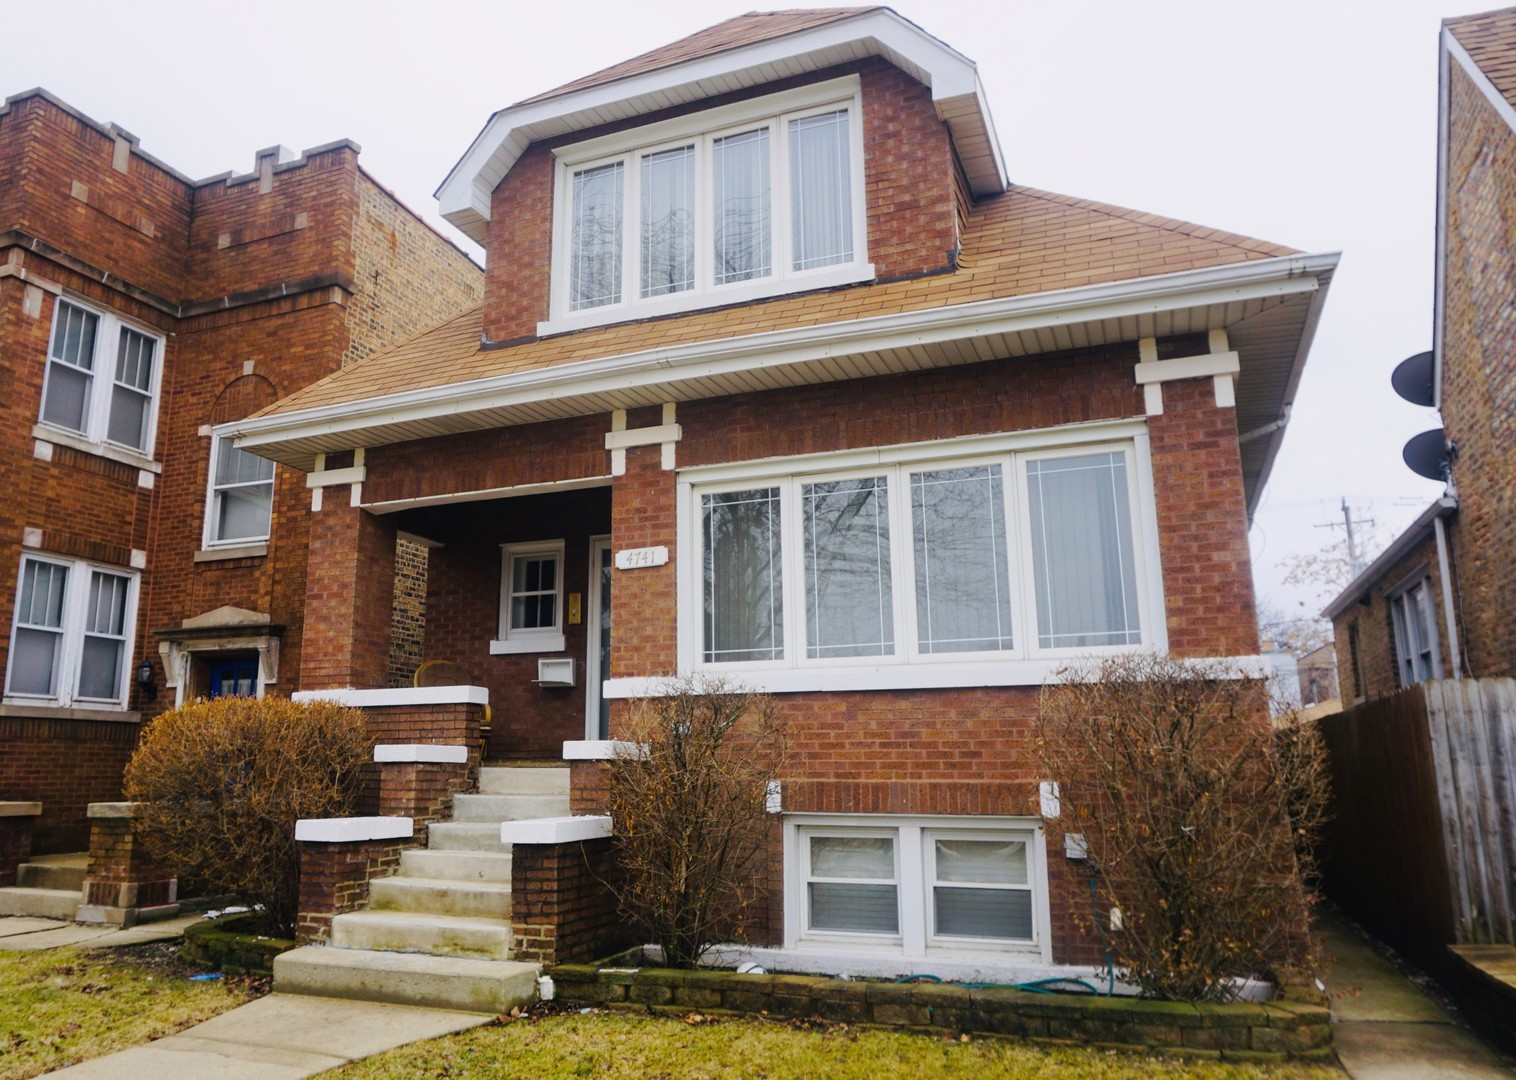 4741 West Altgeld, CHICAGO, Illinois, 60639